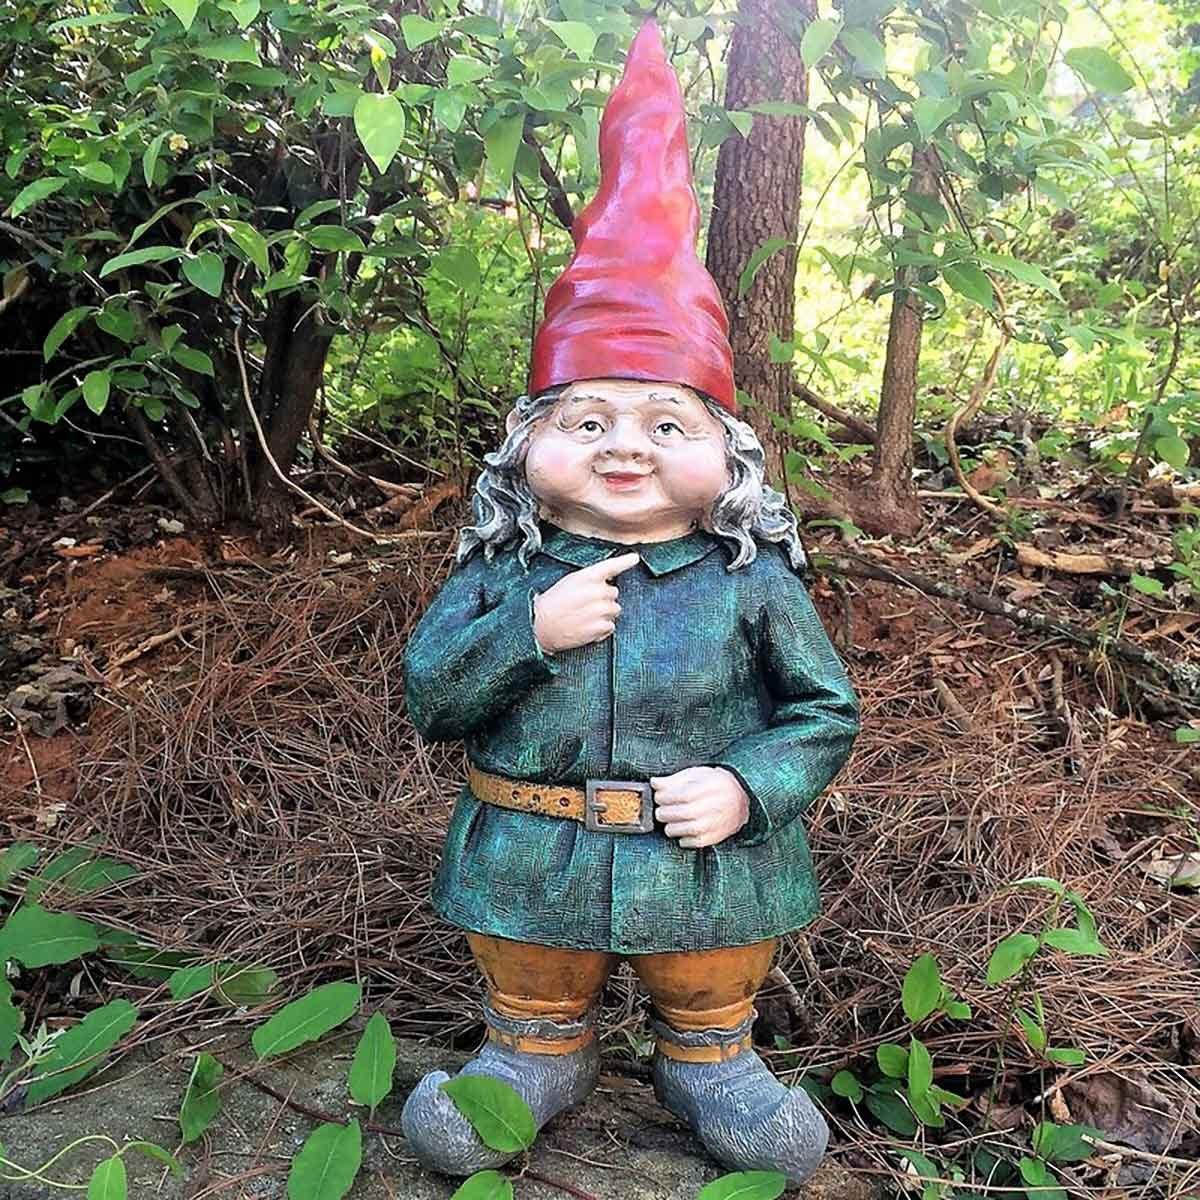 Lady garden gnome